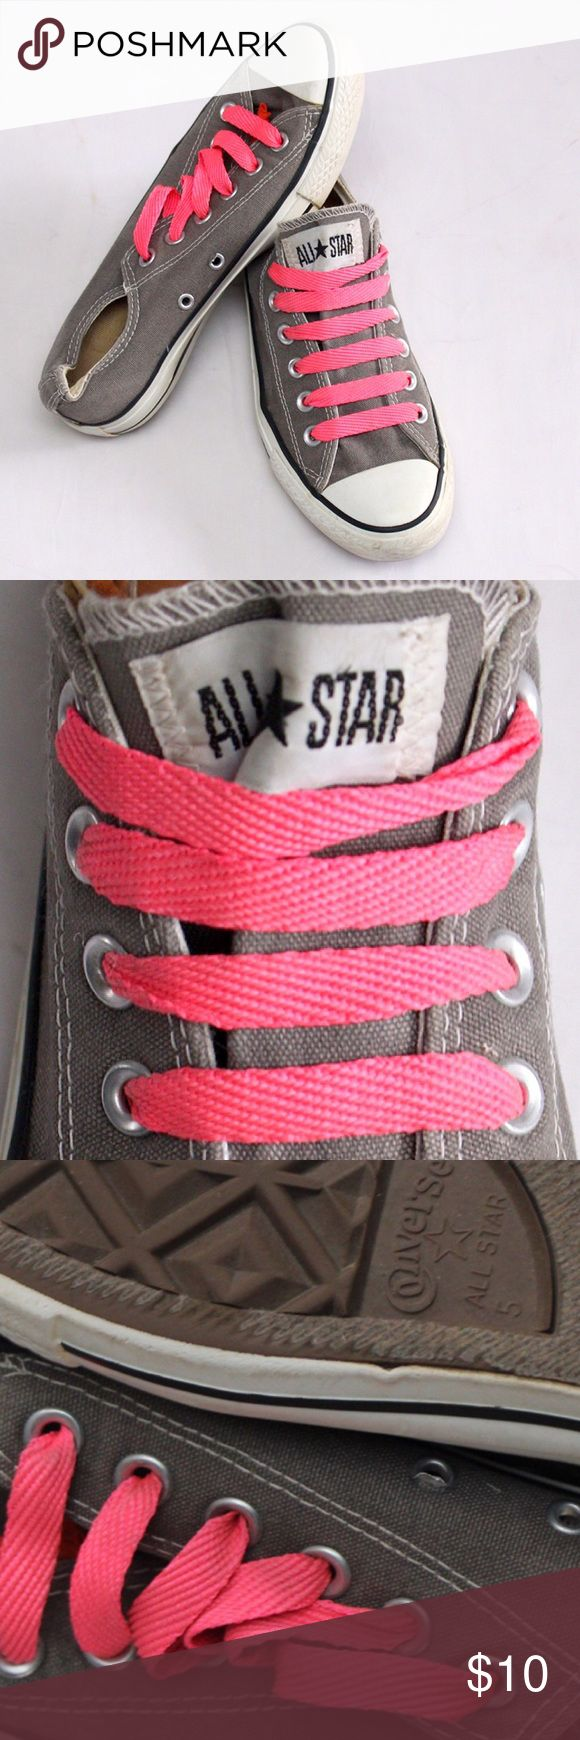 Women's sz 7 converse shoes Women's converse- grey - sz 7 women or 5 men's. Good used condition! Converse Shoes